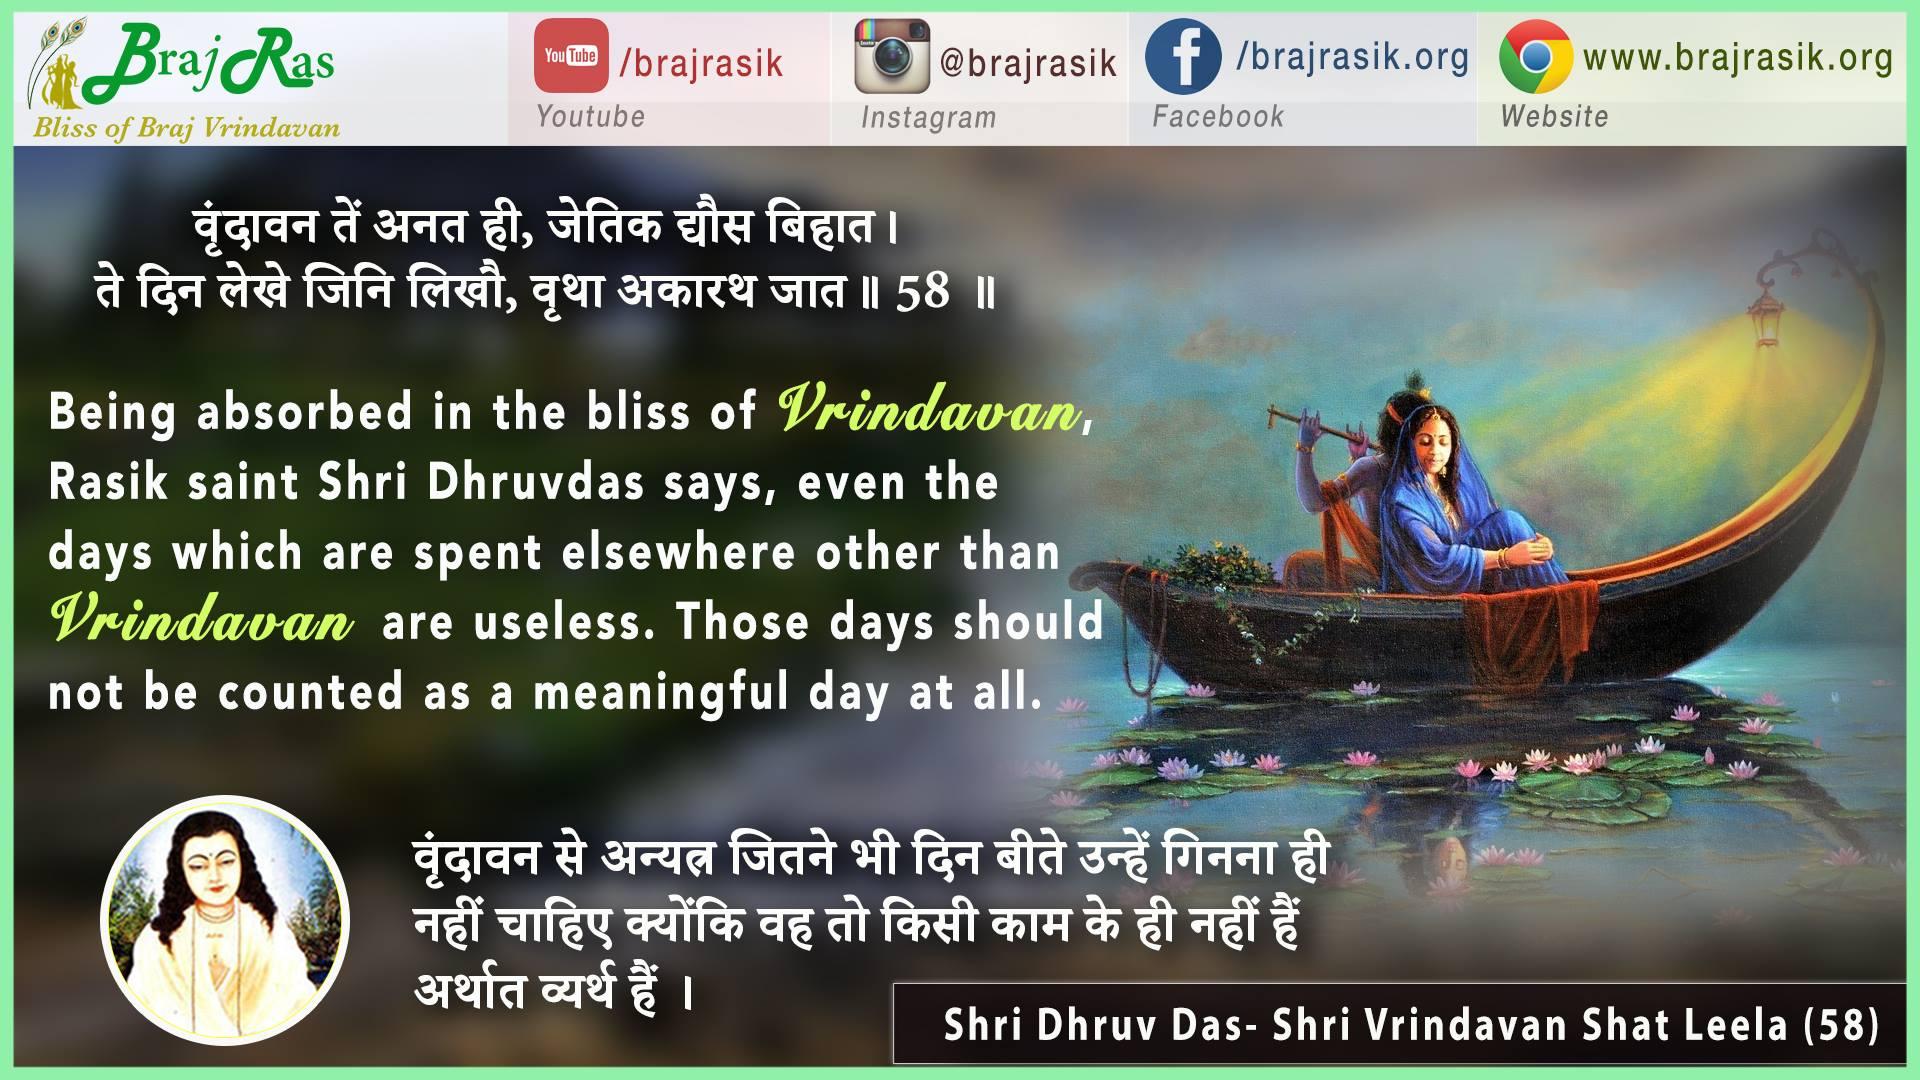 Vrindavan Se Anat Hi Jetik Ghos Vihaat  - Shri Dhruv Das- Shri Vrindavan Shat Leela